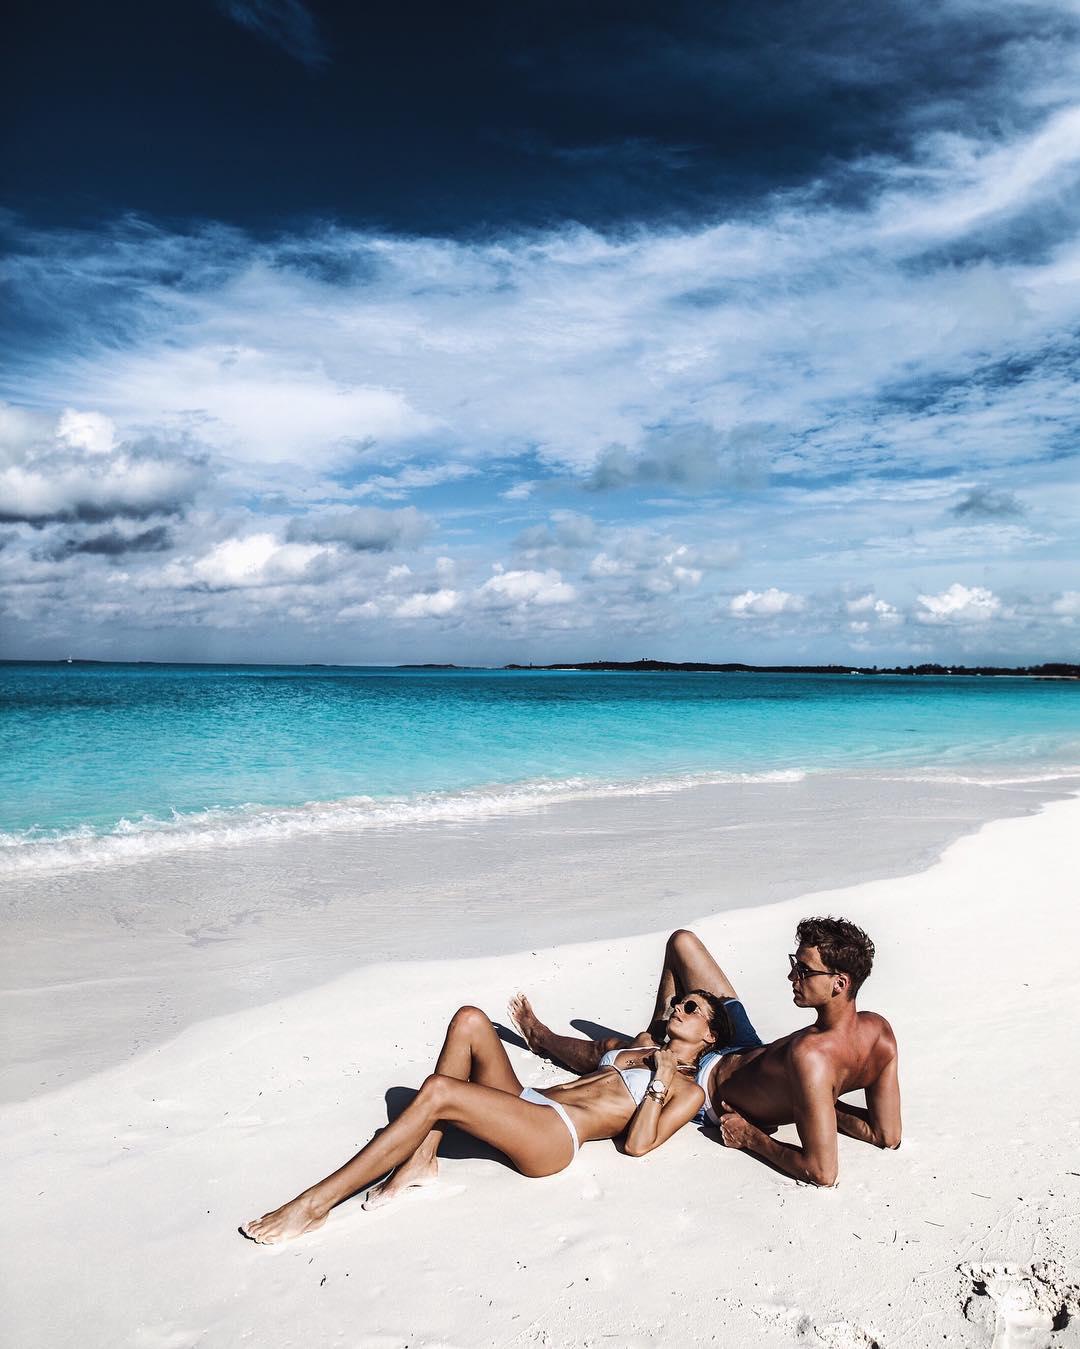 The Exumas, Bahamas. Credits to @debiflue on Instagram